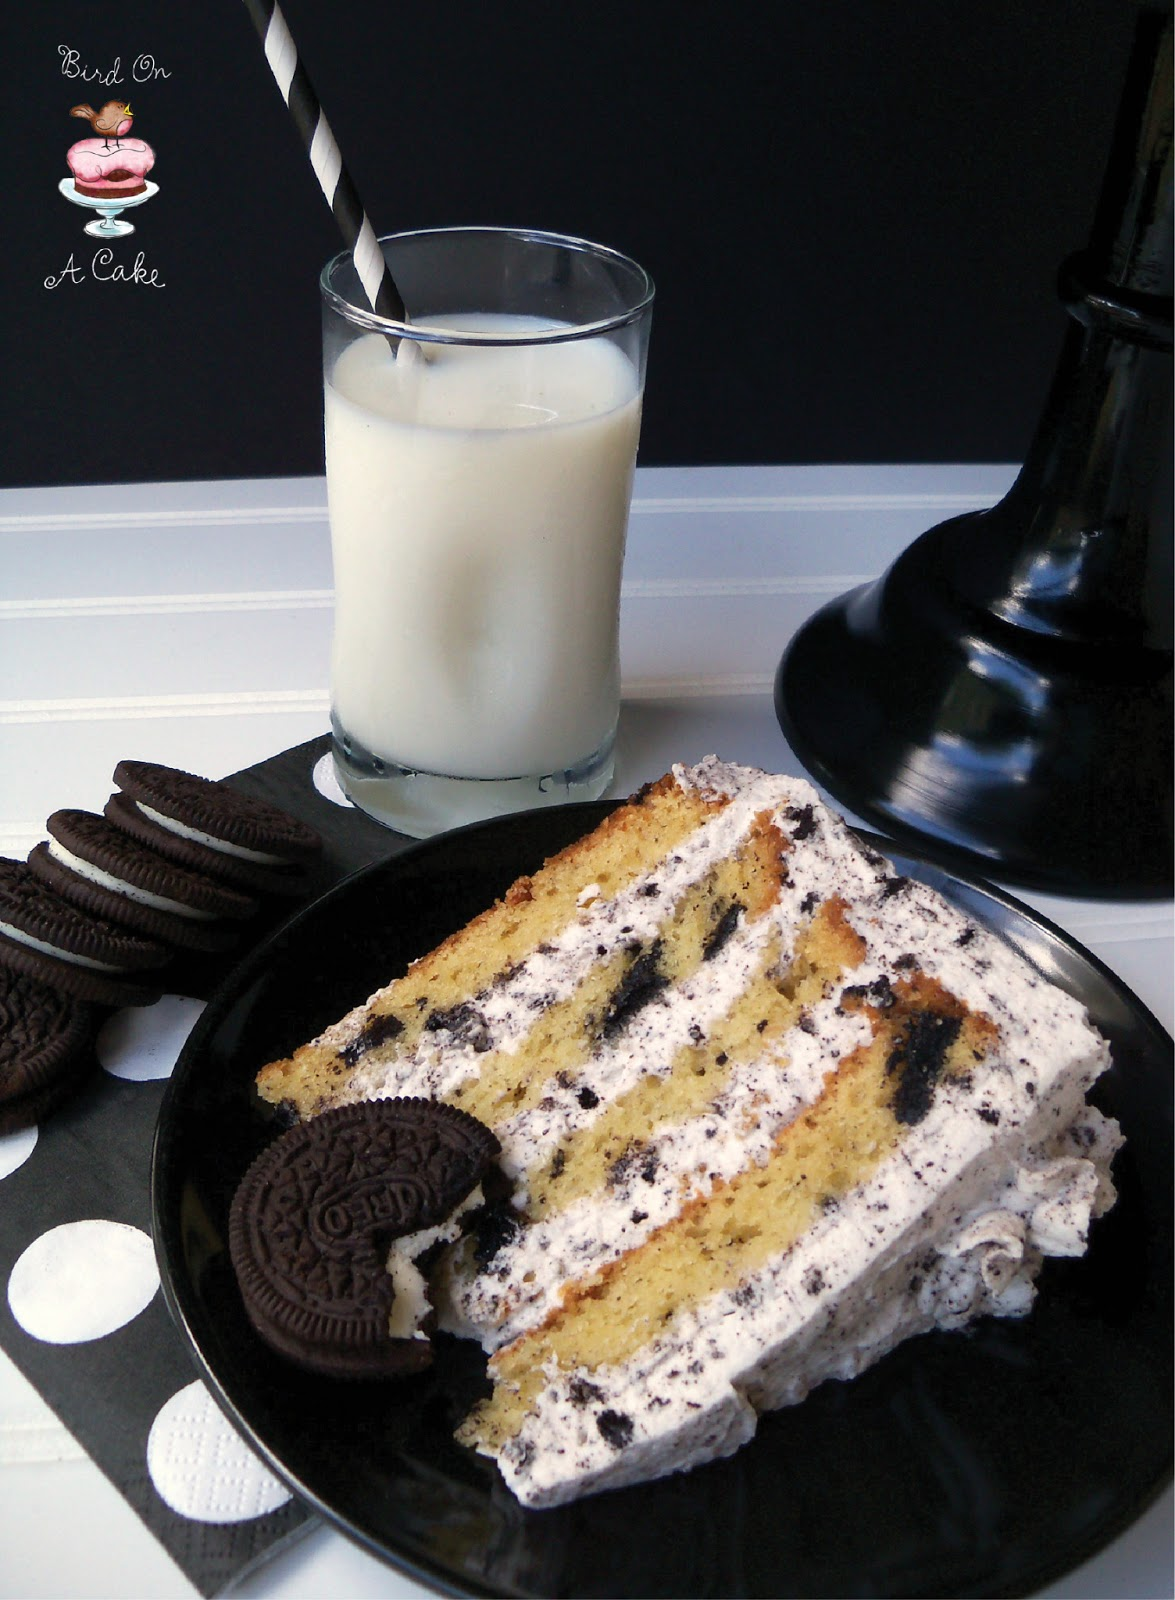 Bird On A Cake Oreo Cookies and Cream Cake